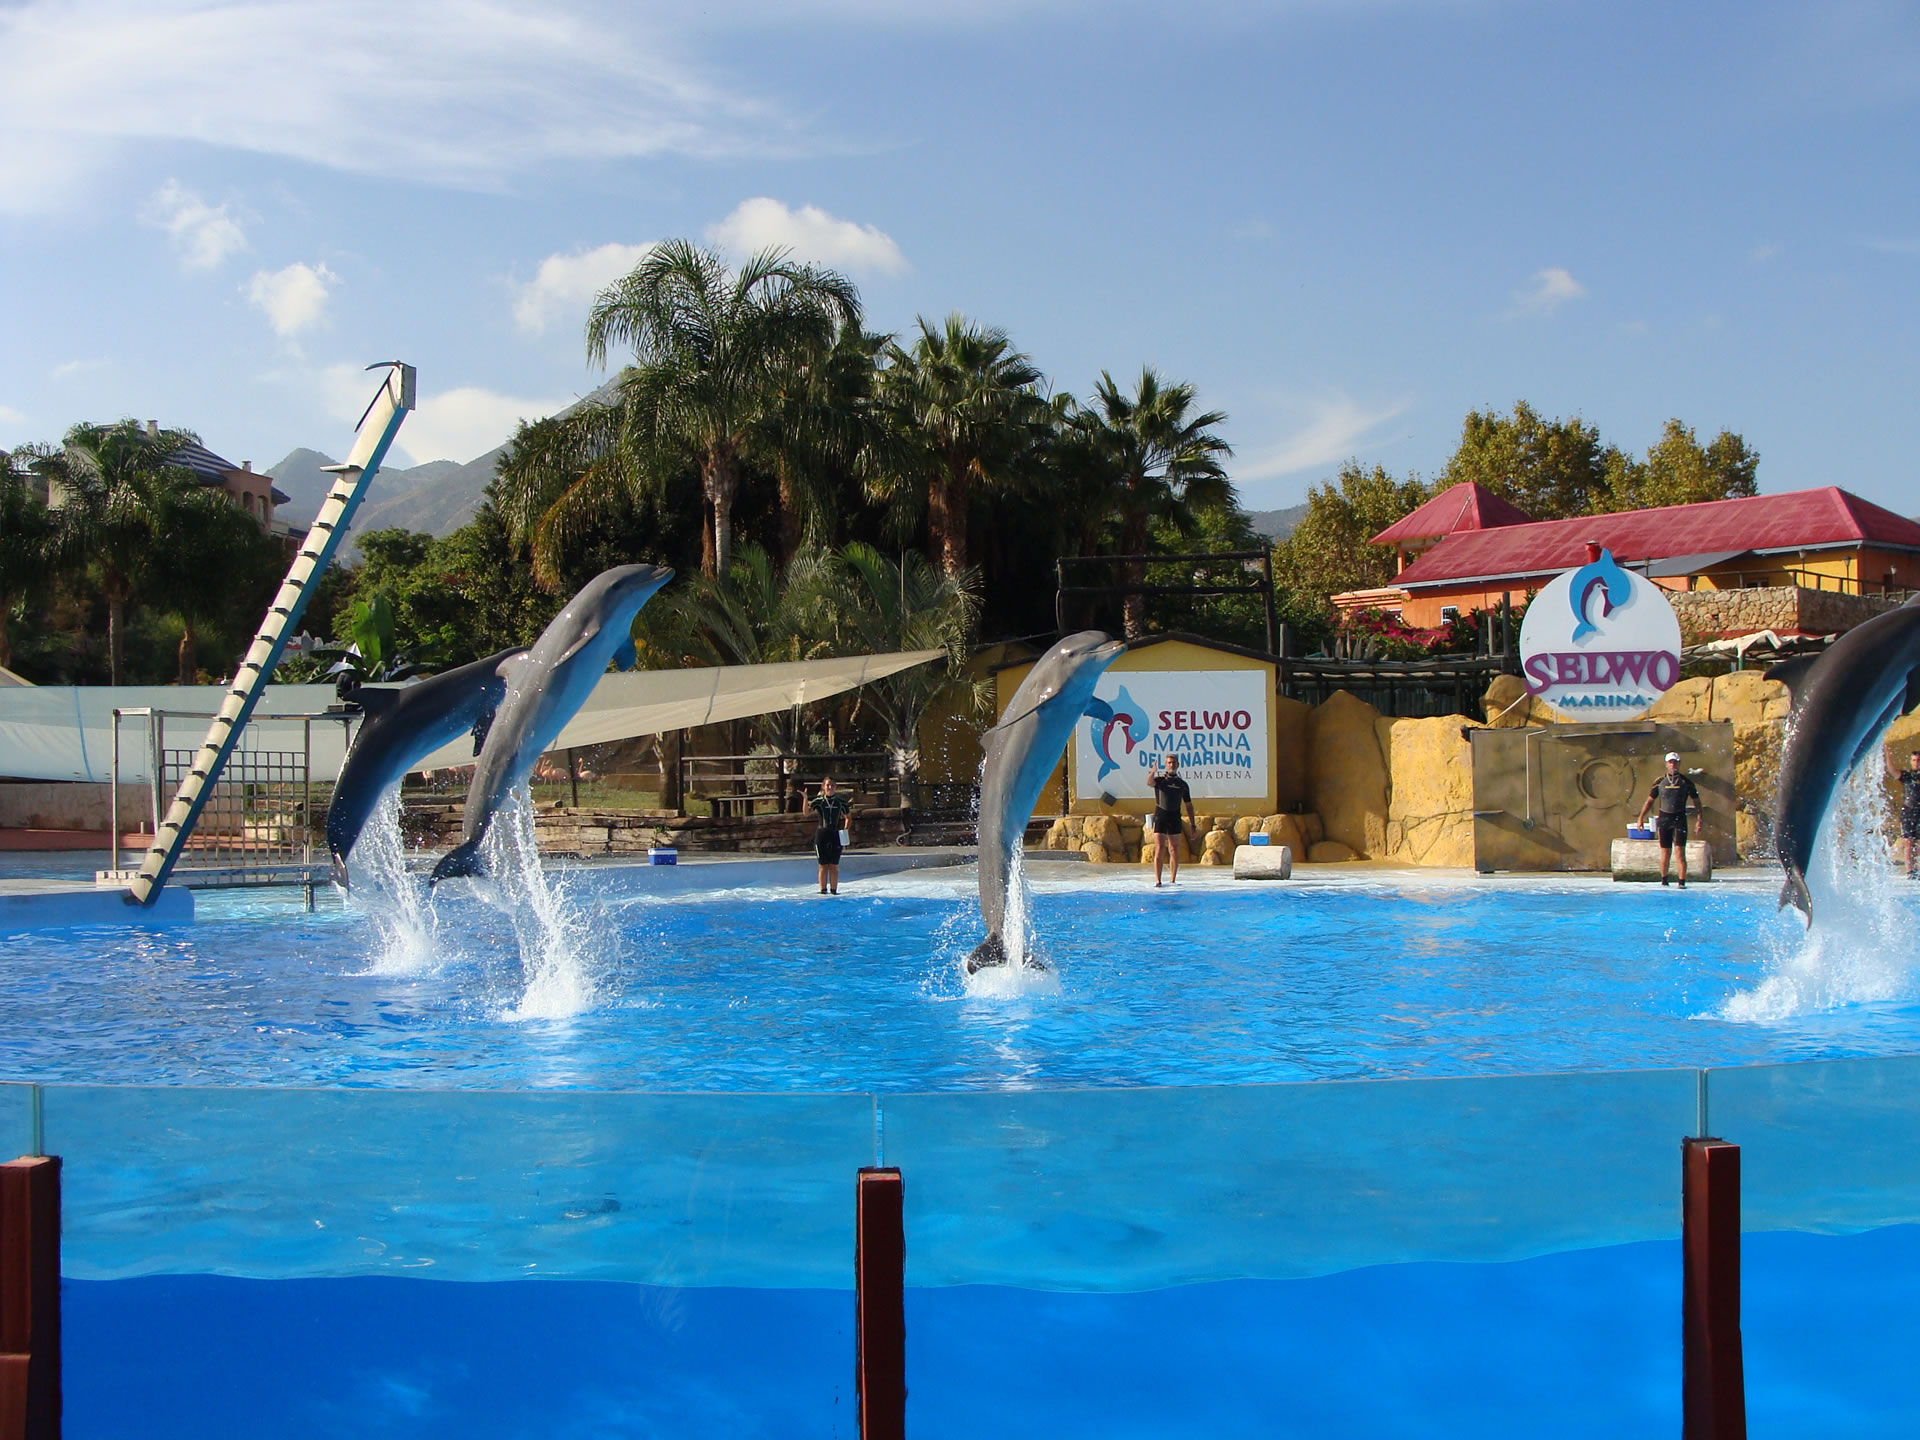 Parque Acuatico Mijas - Mijas Aquatic Park